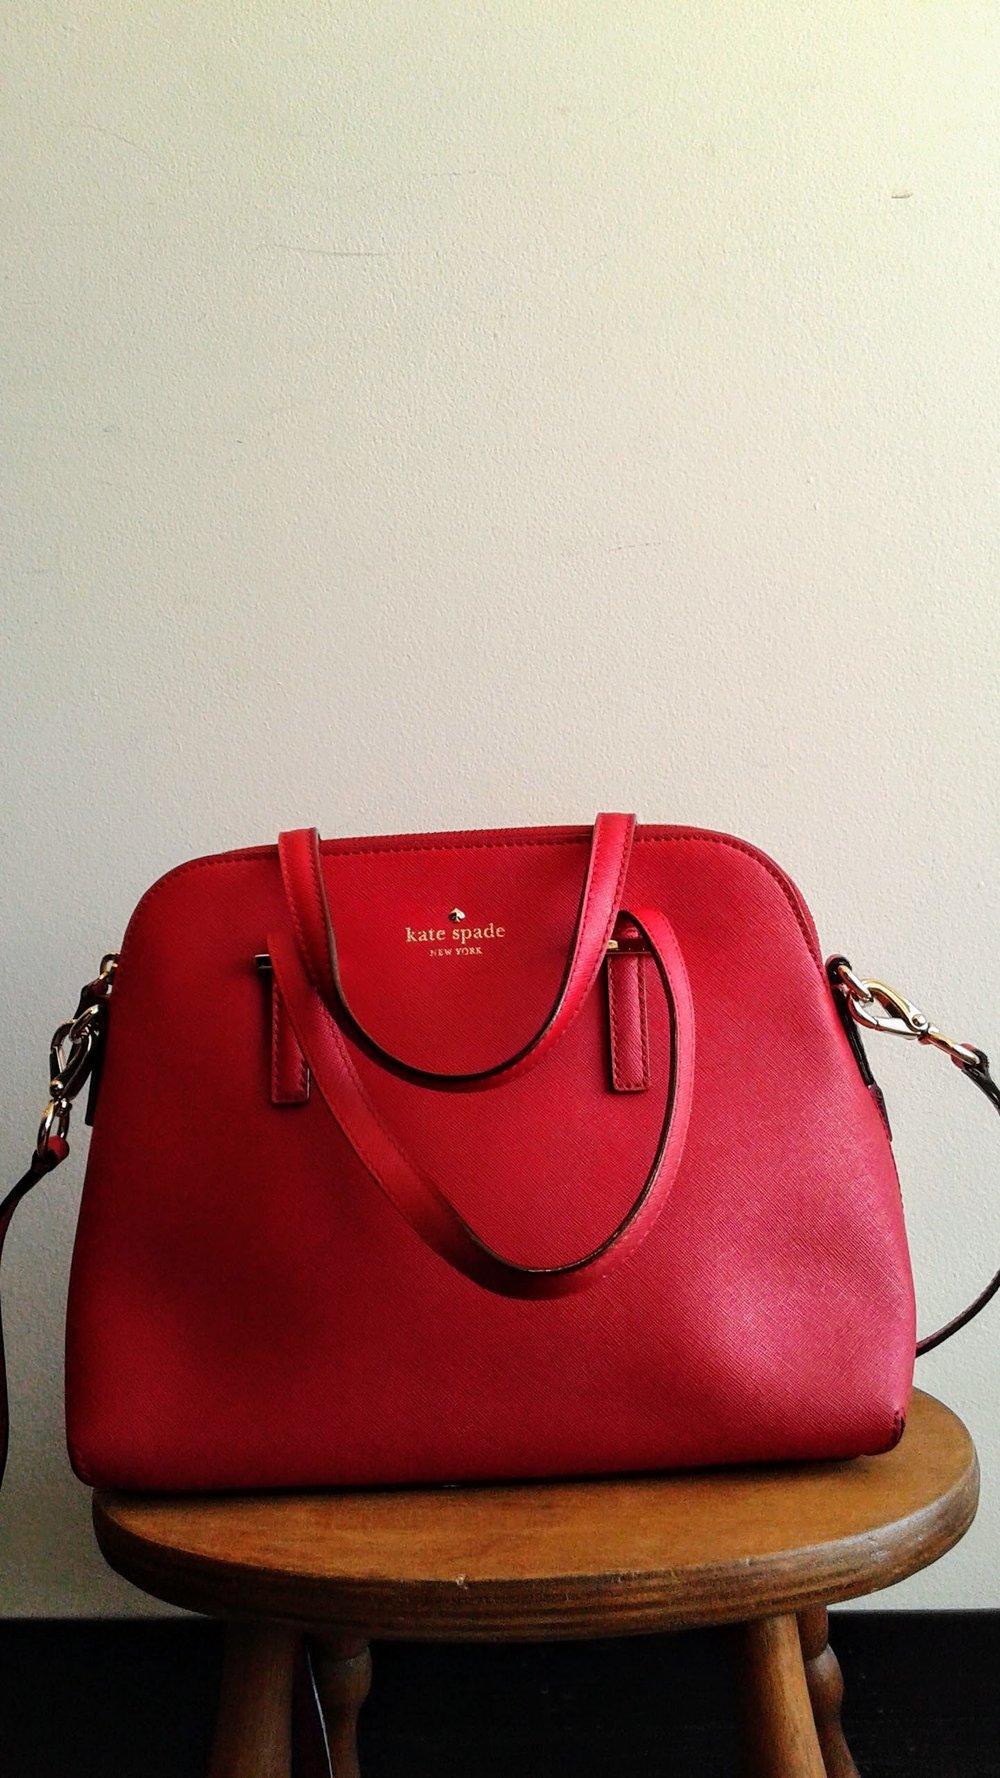 Kate Spade purse, $95